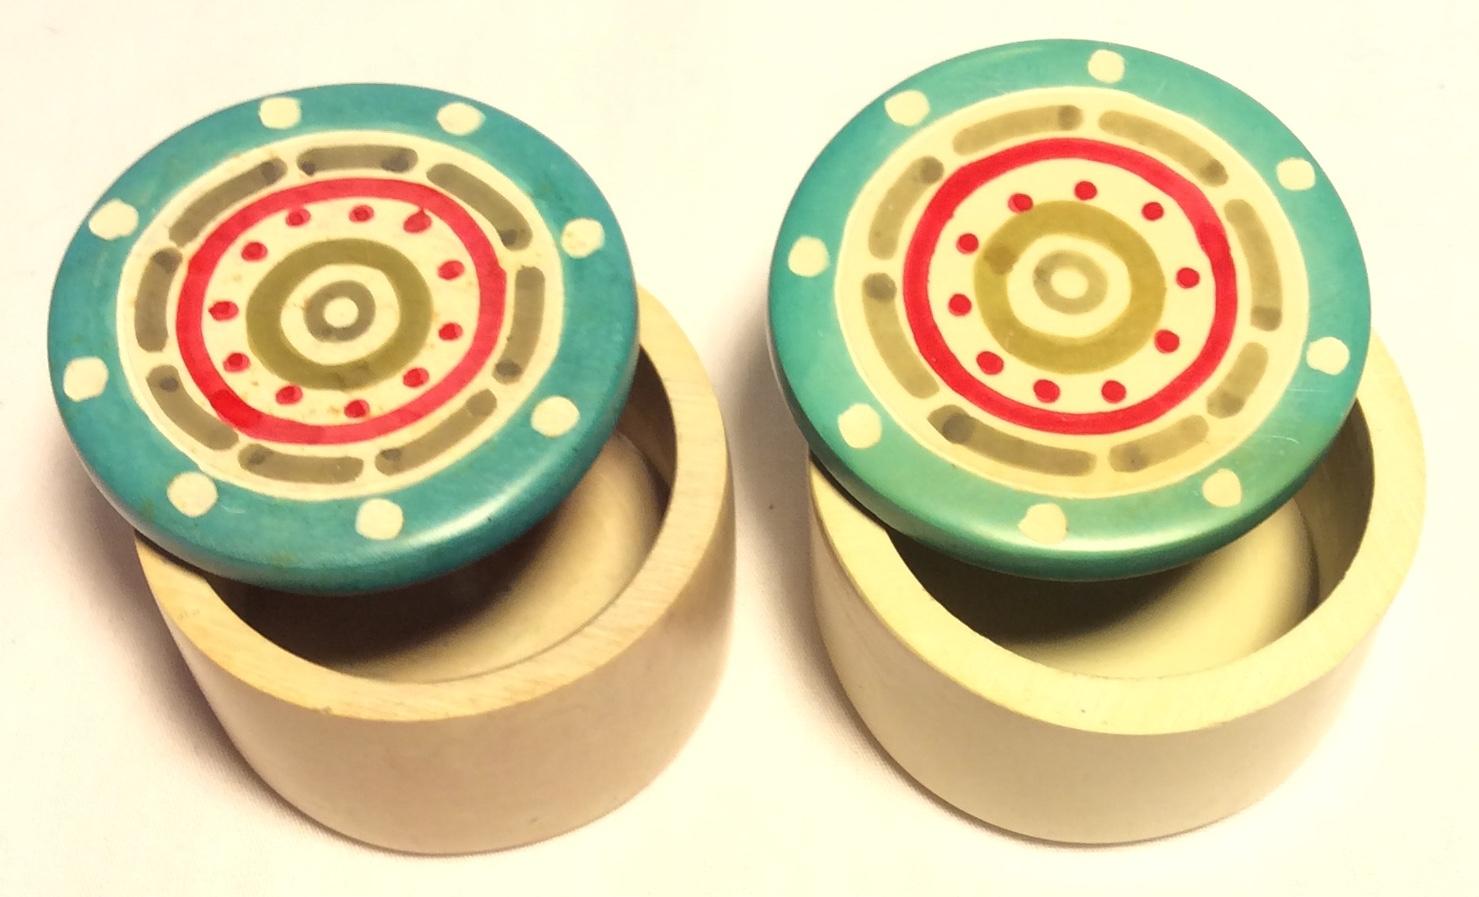 Cream small round stone containers